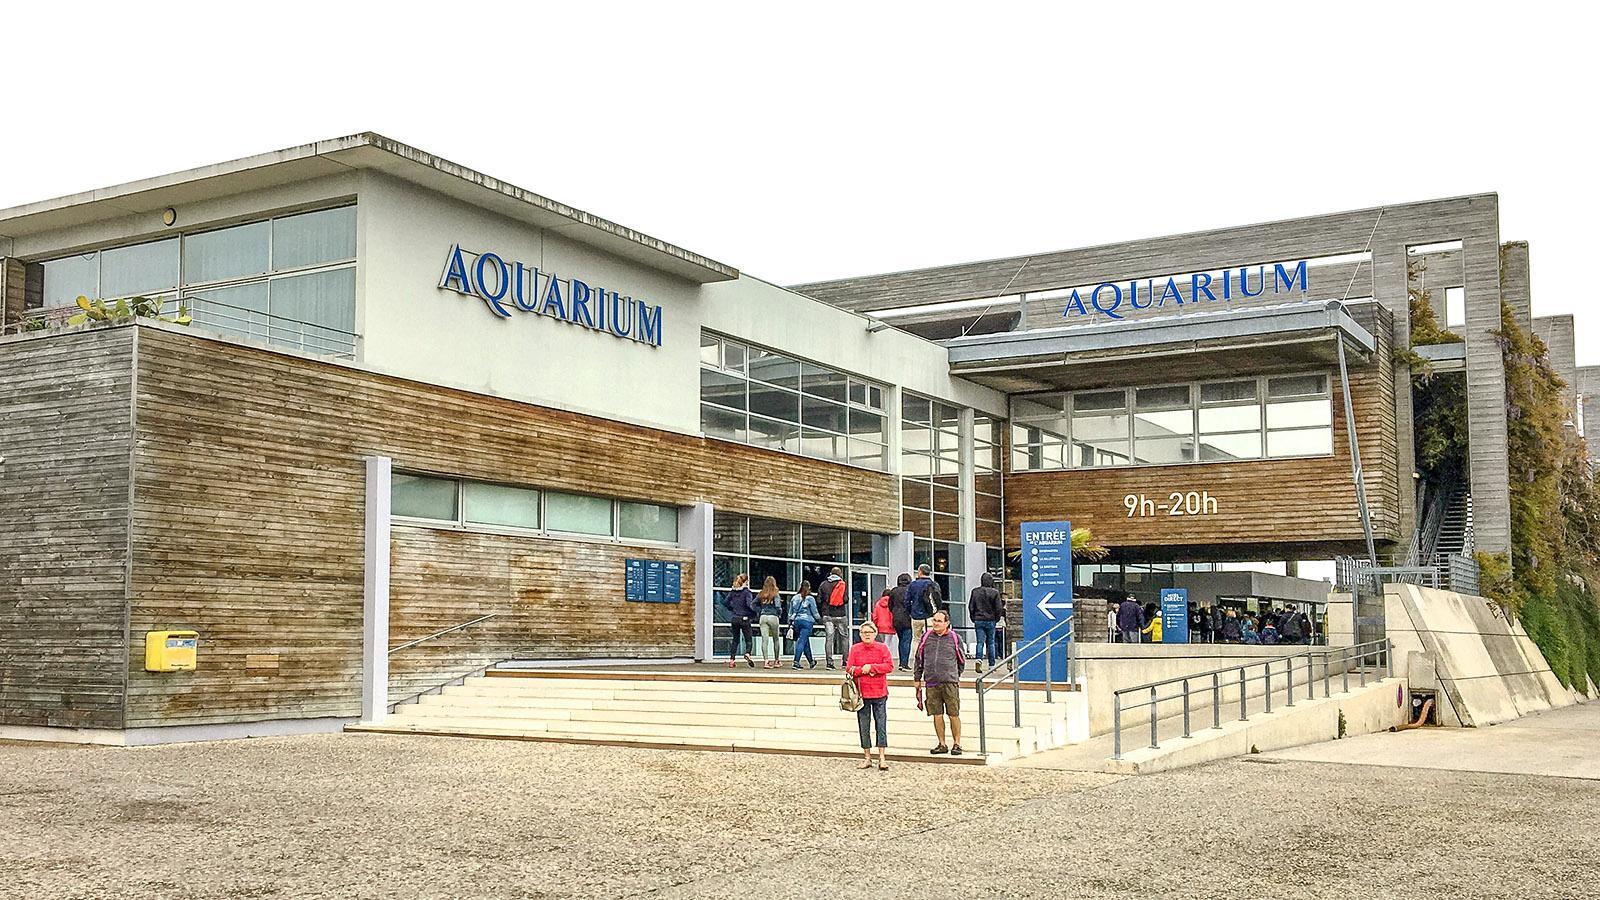 Poitou-Charentes: Das Aquarium von La Rochelle. Foto: Hilke Maunder